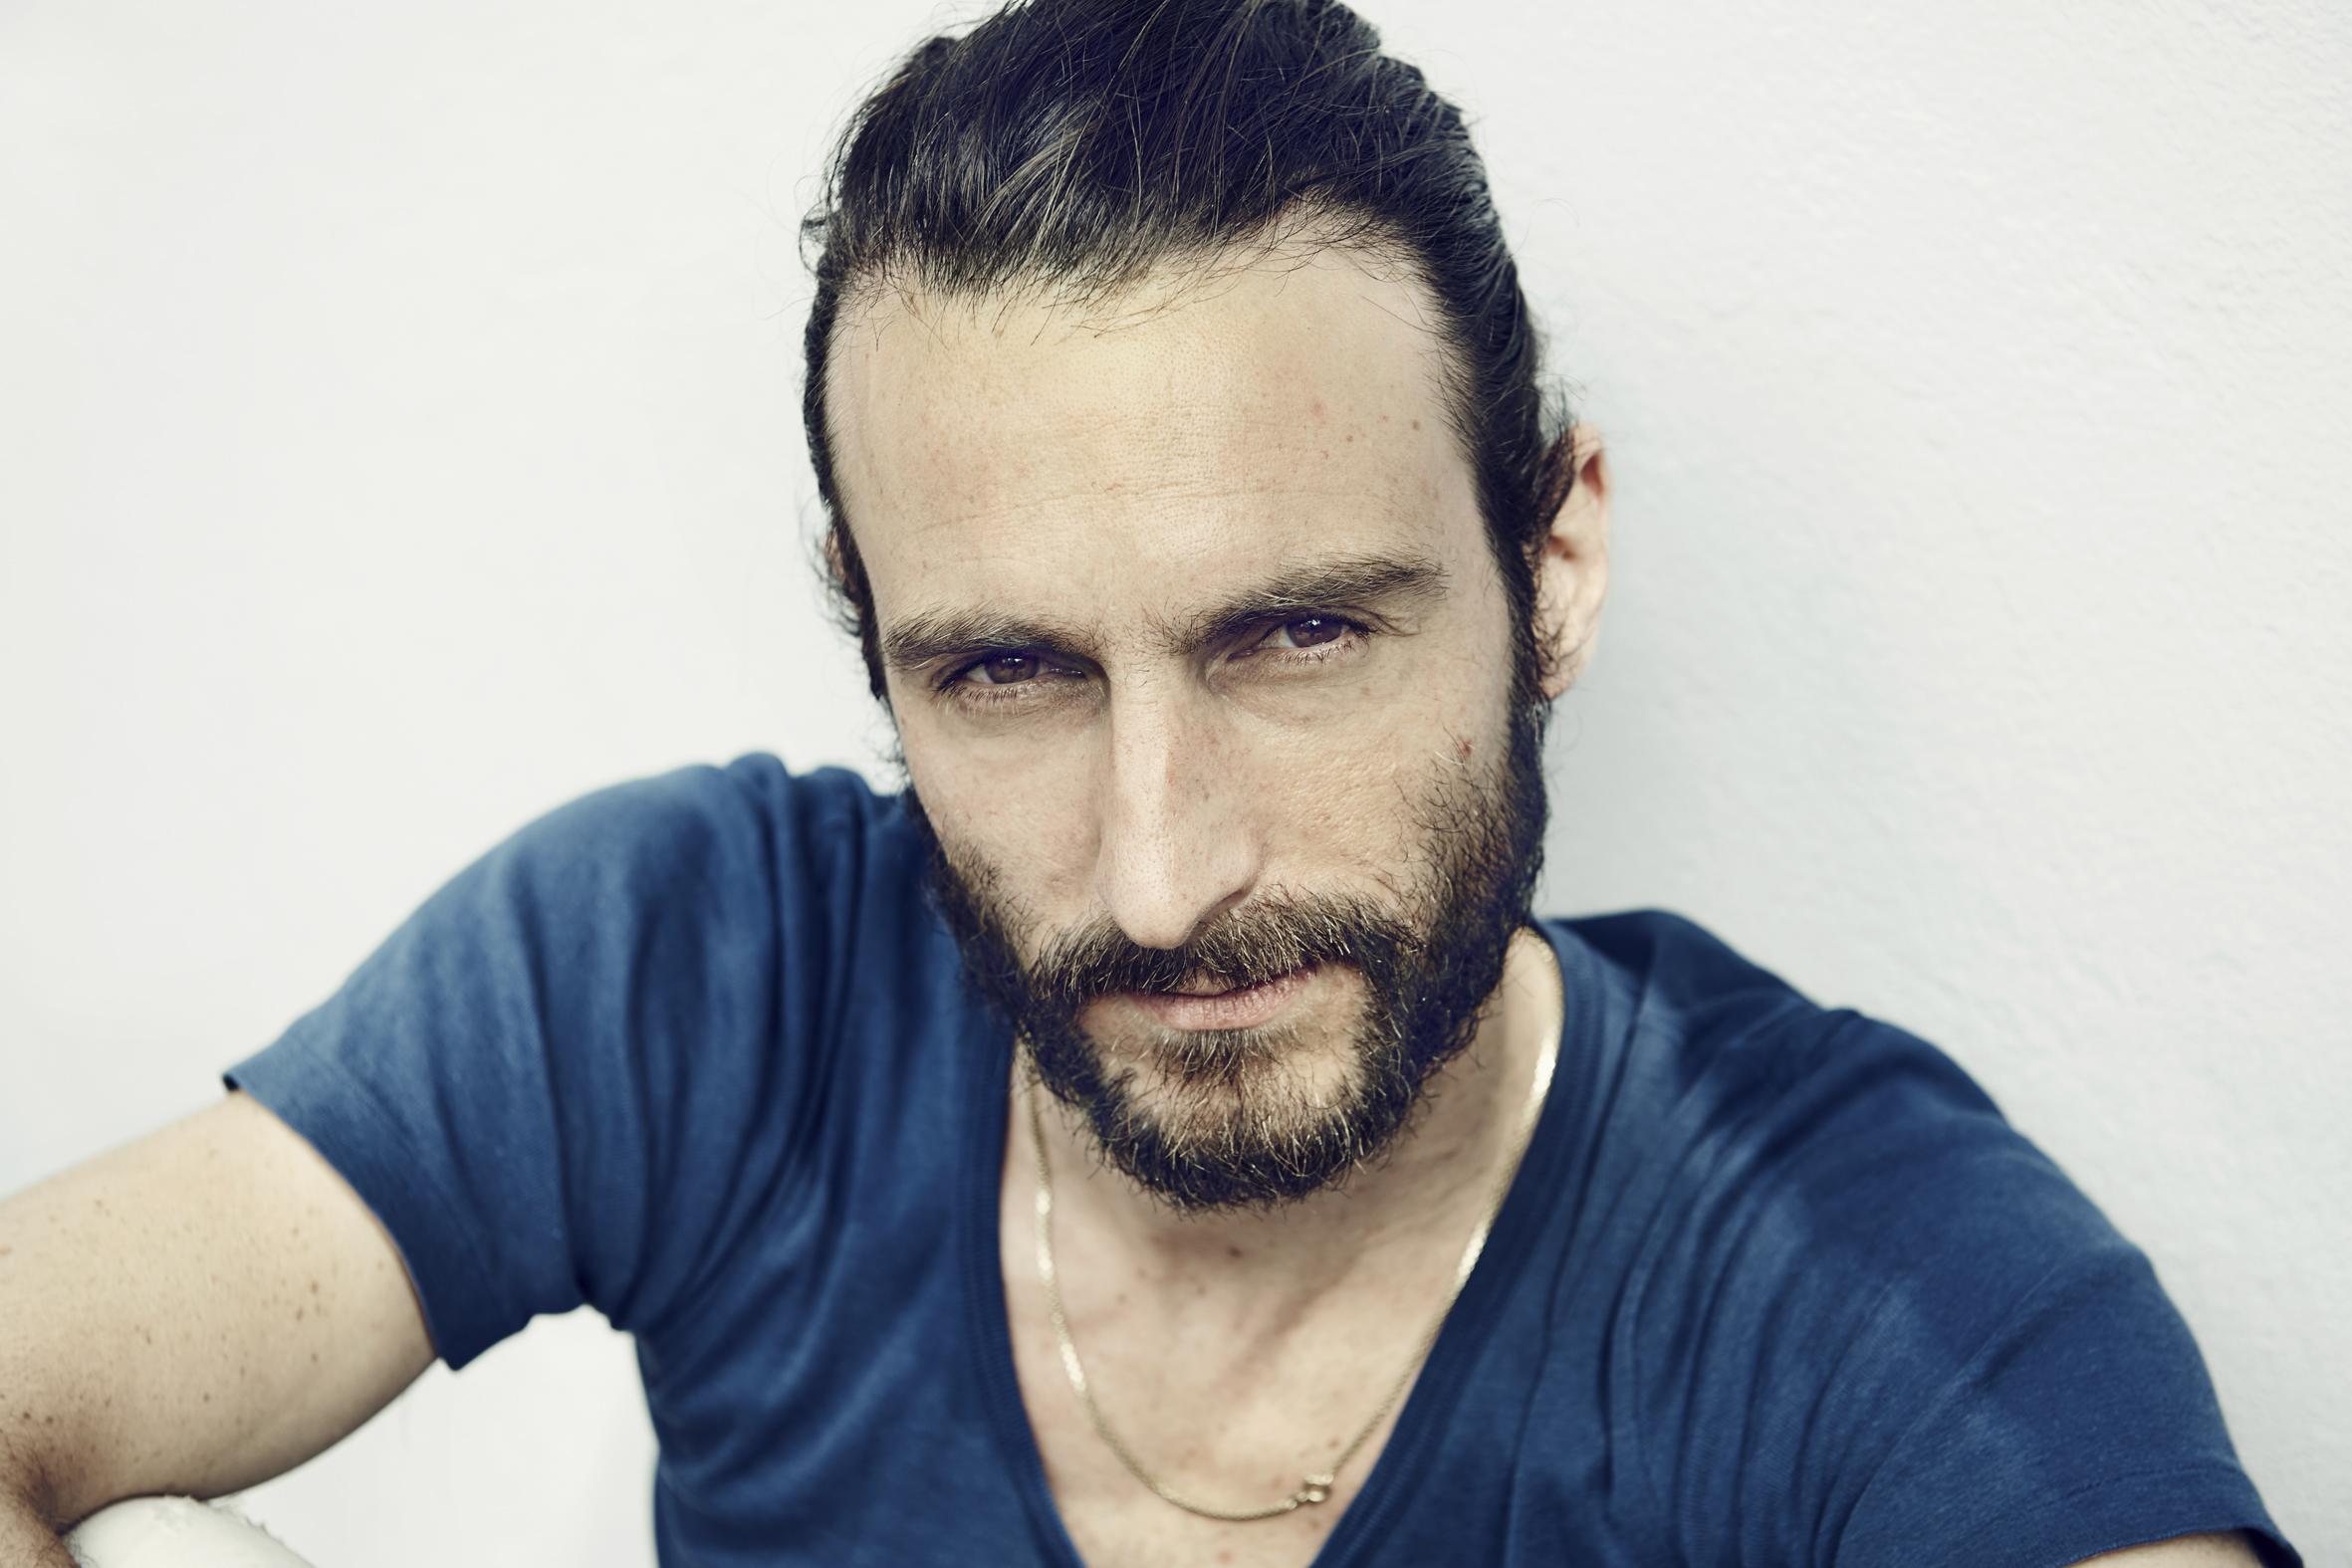 Luc-Mueller-Schauspieler-2016-016.jpg